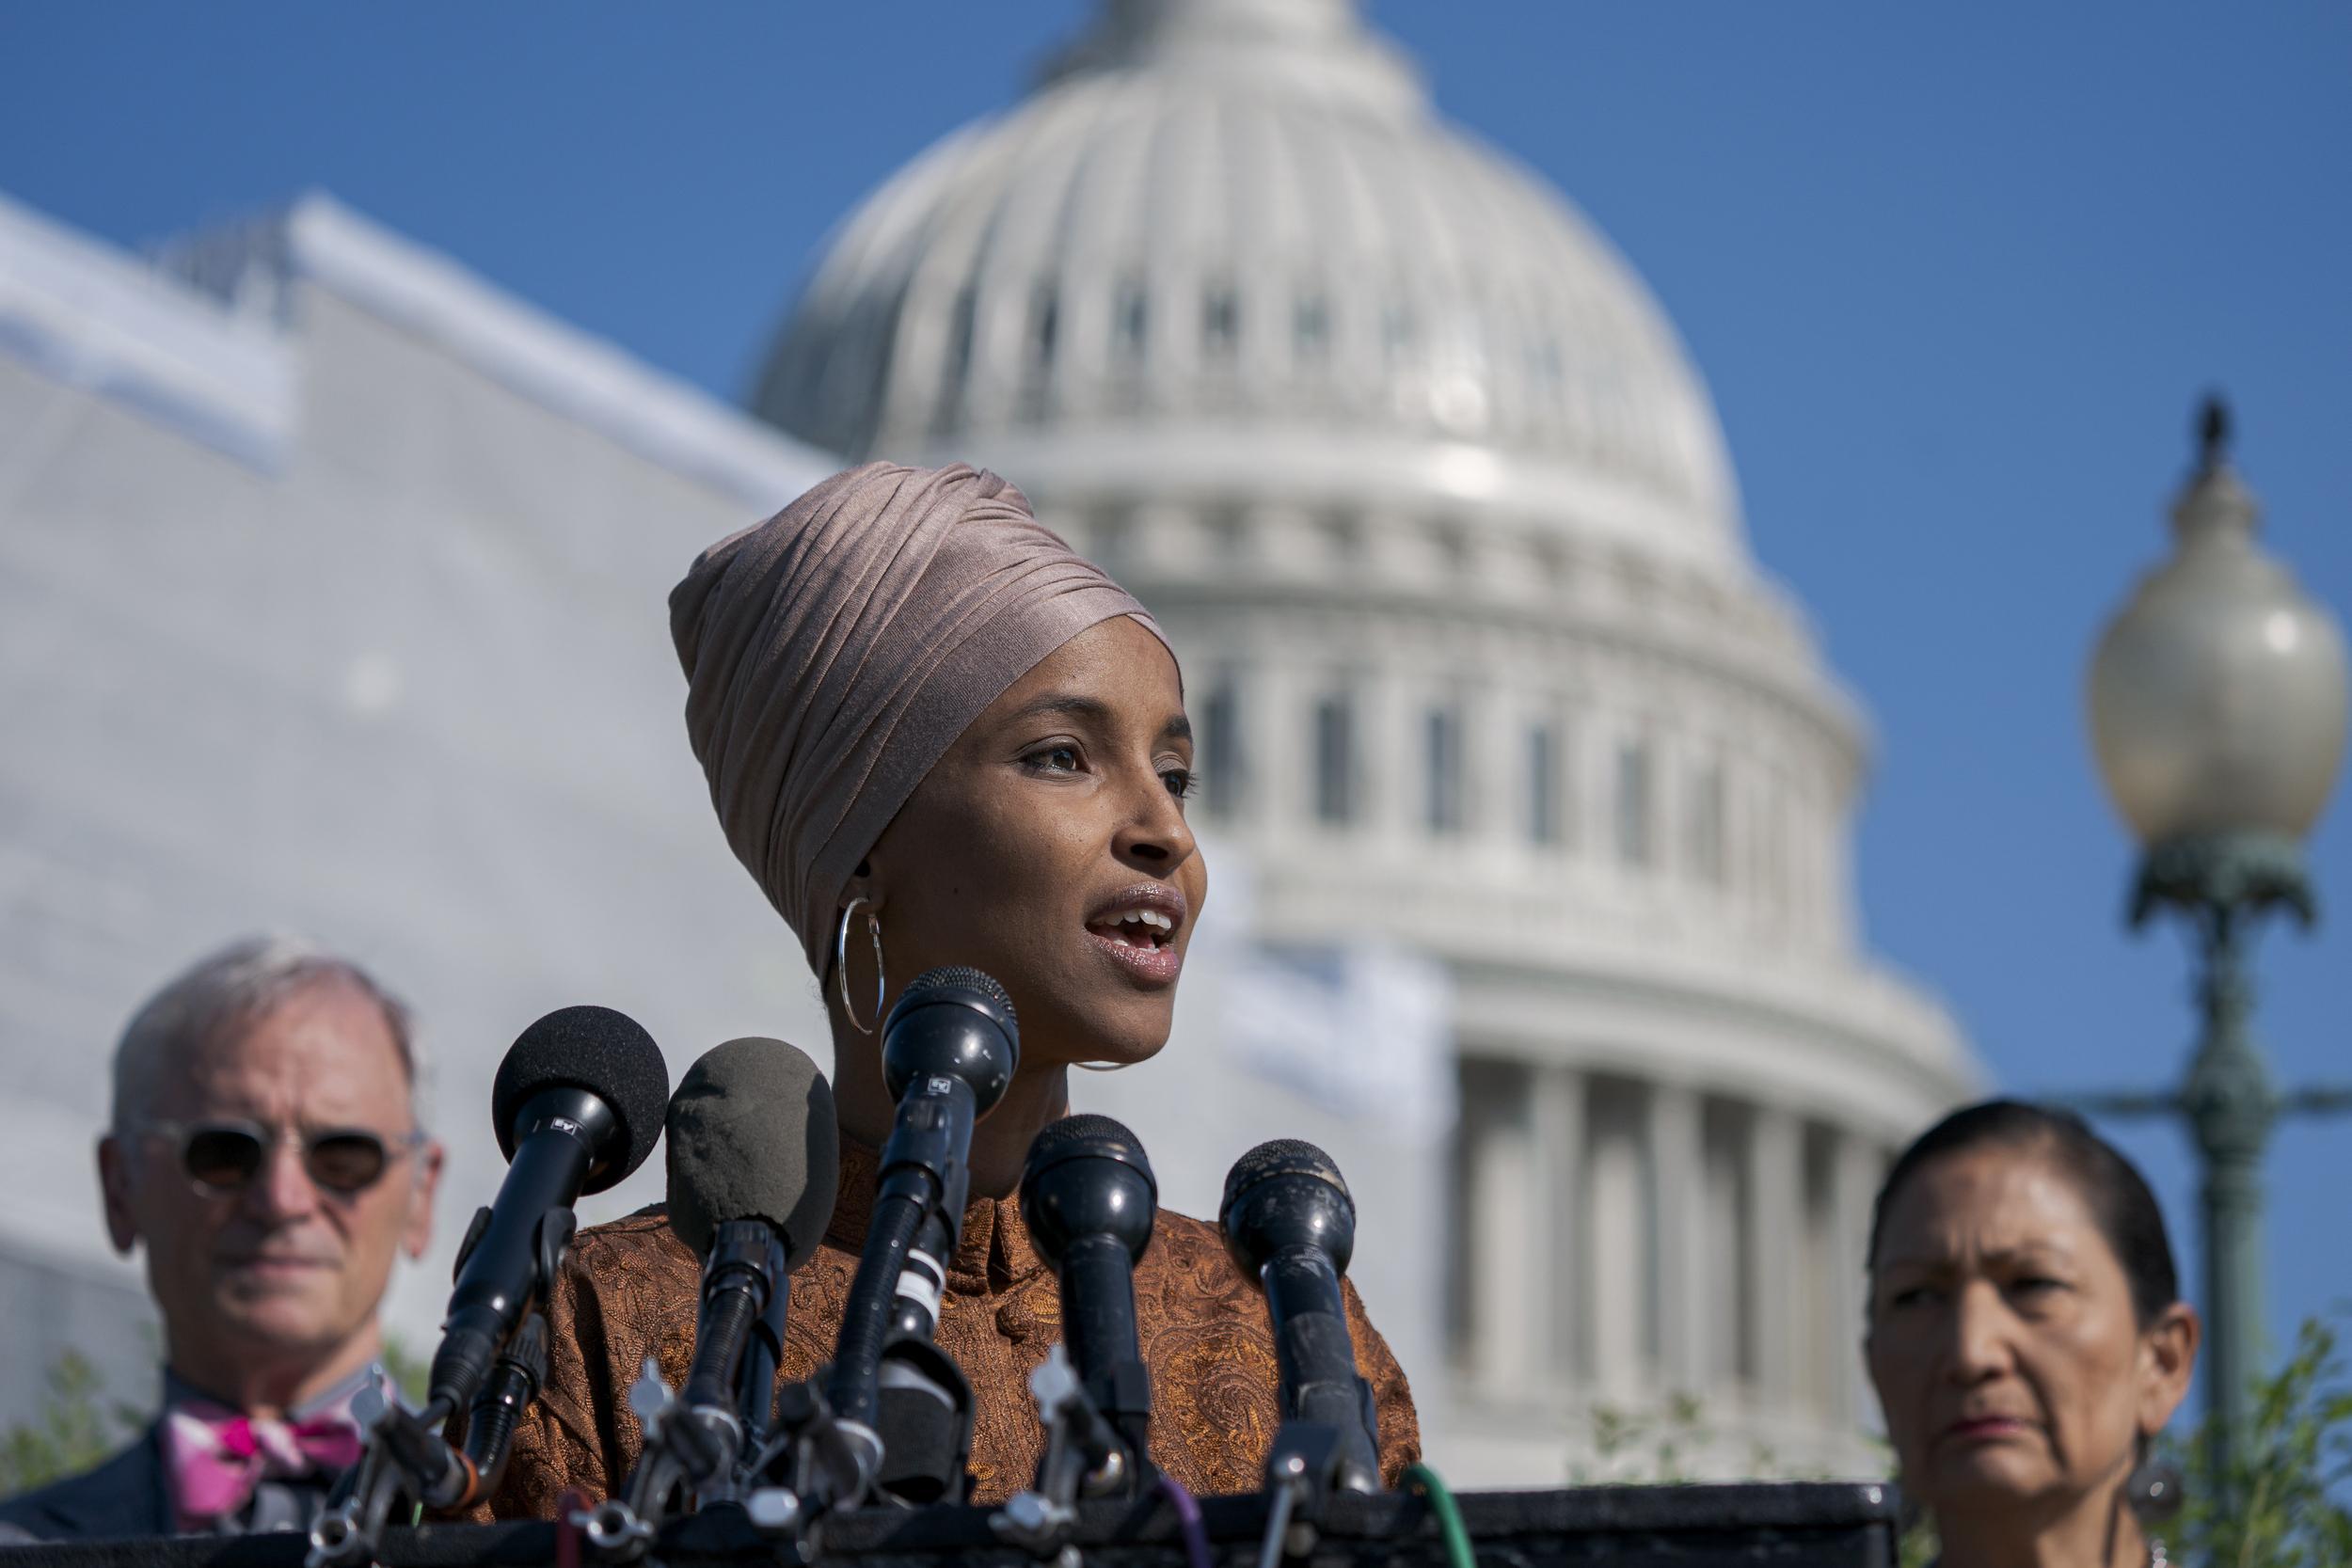 GOP challenger brands Muslim congresswoman Omar a 'jihadi' with shared Facebook post